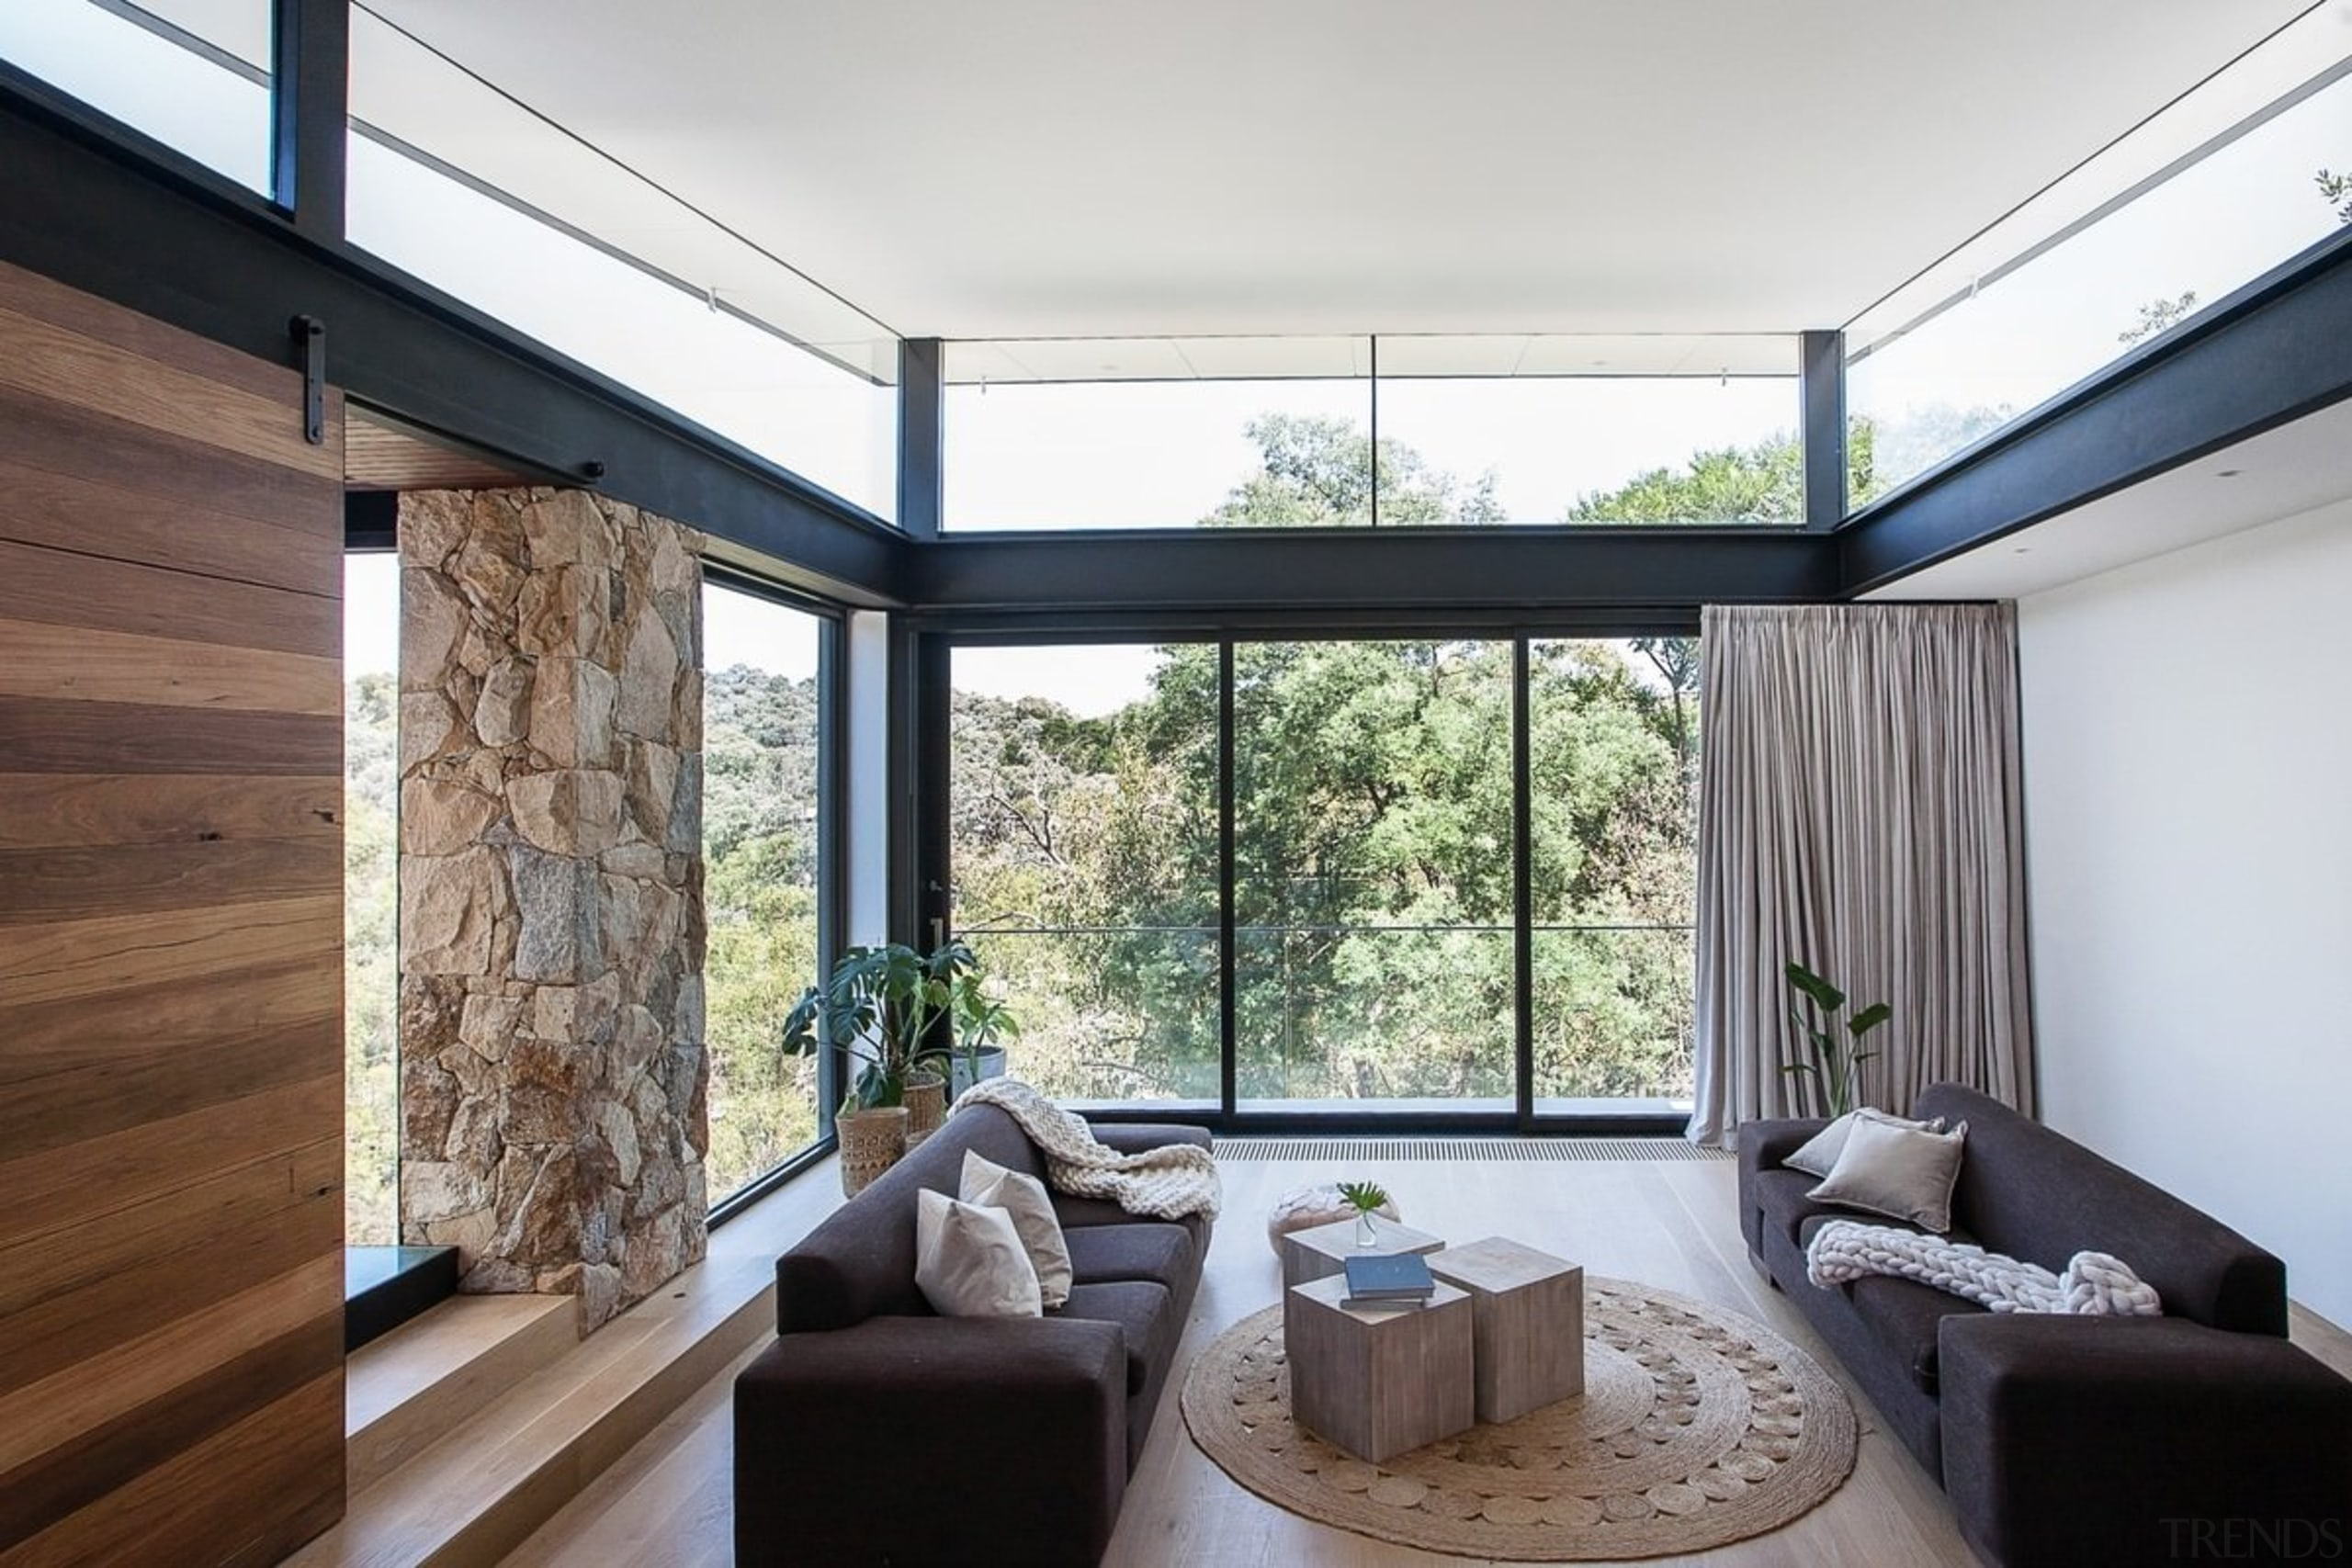 Architect: Alexandra Buchanan ArchitecturePhotography by Debra McFadzean architecture, ceiling, daylighting, house, interior design, living room, property, real estate, window, white